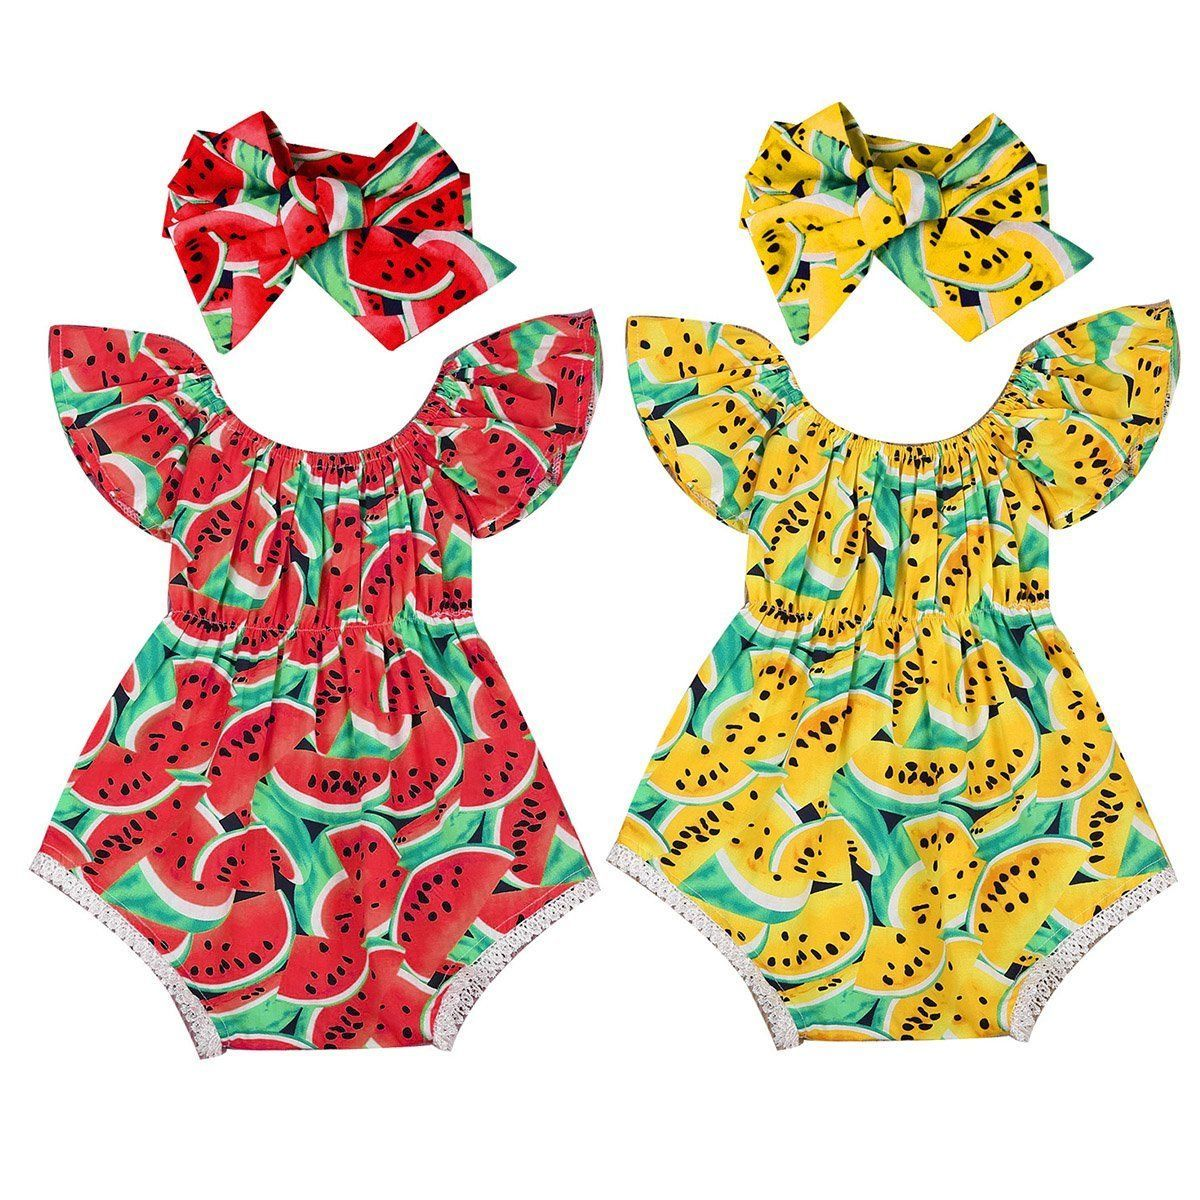 fc71a4daf Newborn Infant Baby Girl Cotton Romper Bodysuit Jumpsuit Headband ...